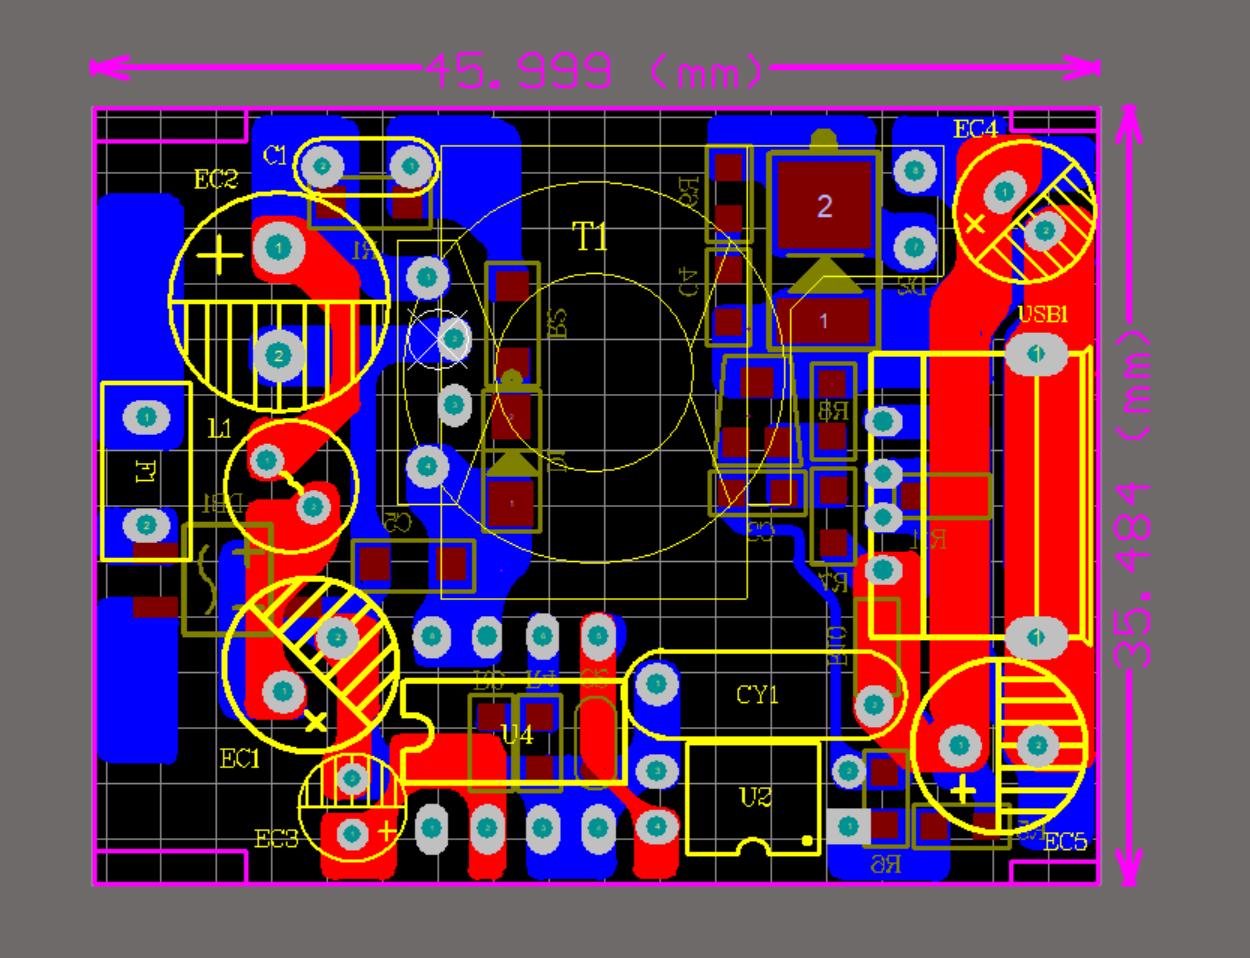 DK1208 5V2.4A 方案展示